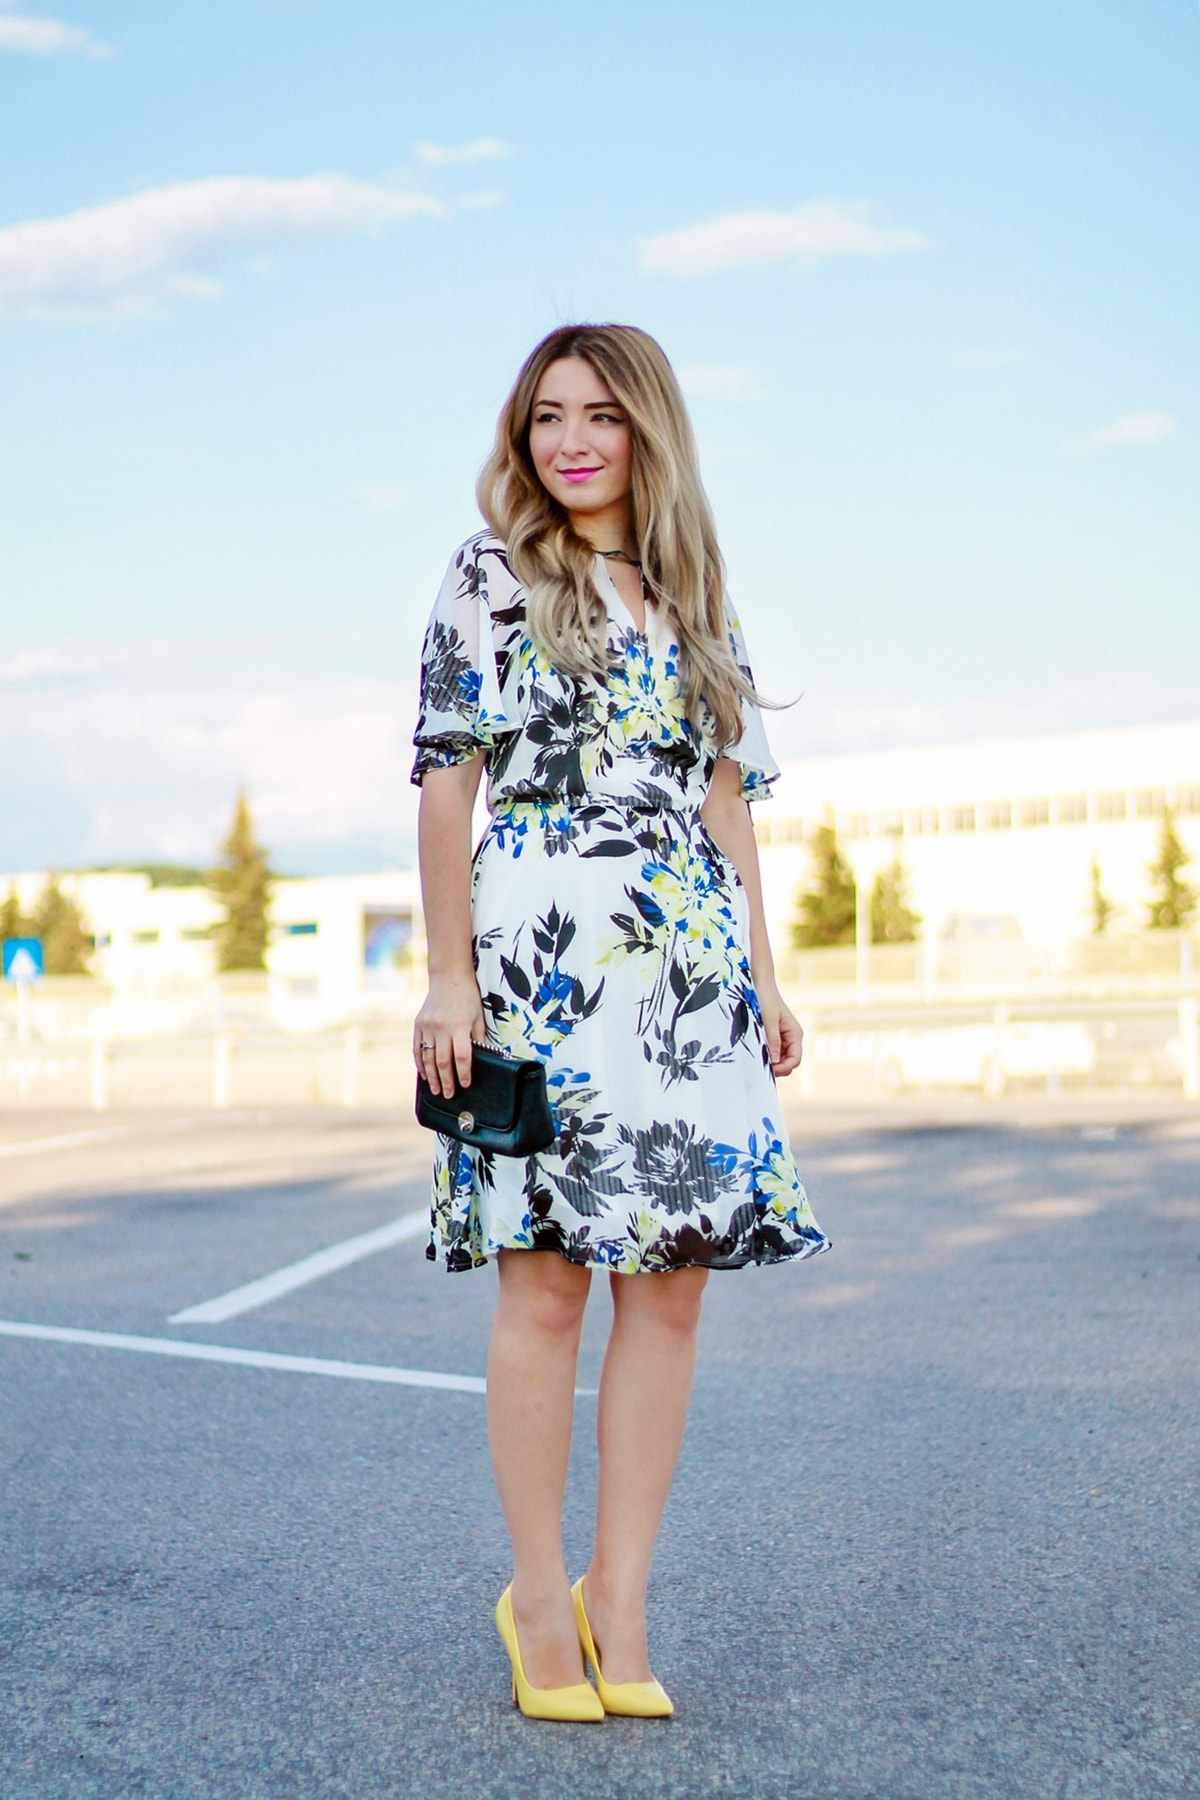 Rochie de vara, vaporoasa, cu imprimeu floral - Woman Fashion, Andreea Ristea, tinuta de vara, blogger moda Pitesti